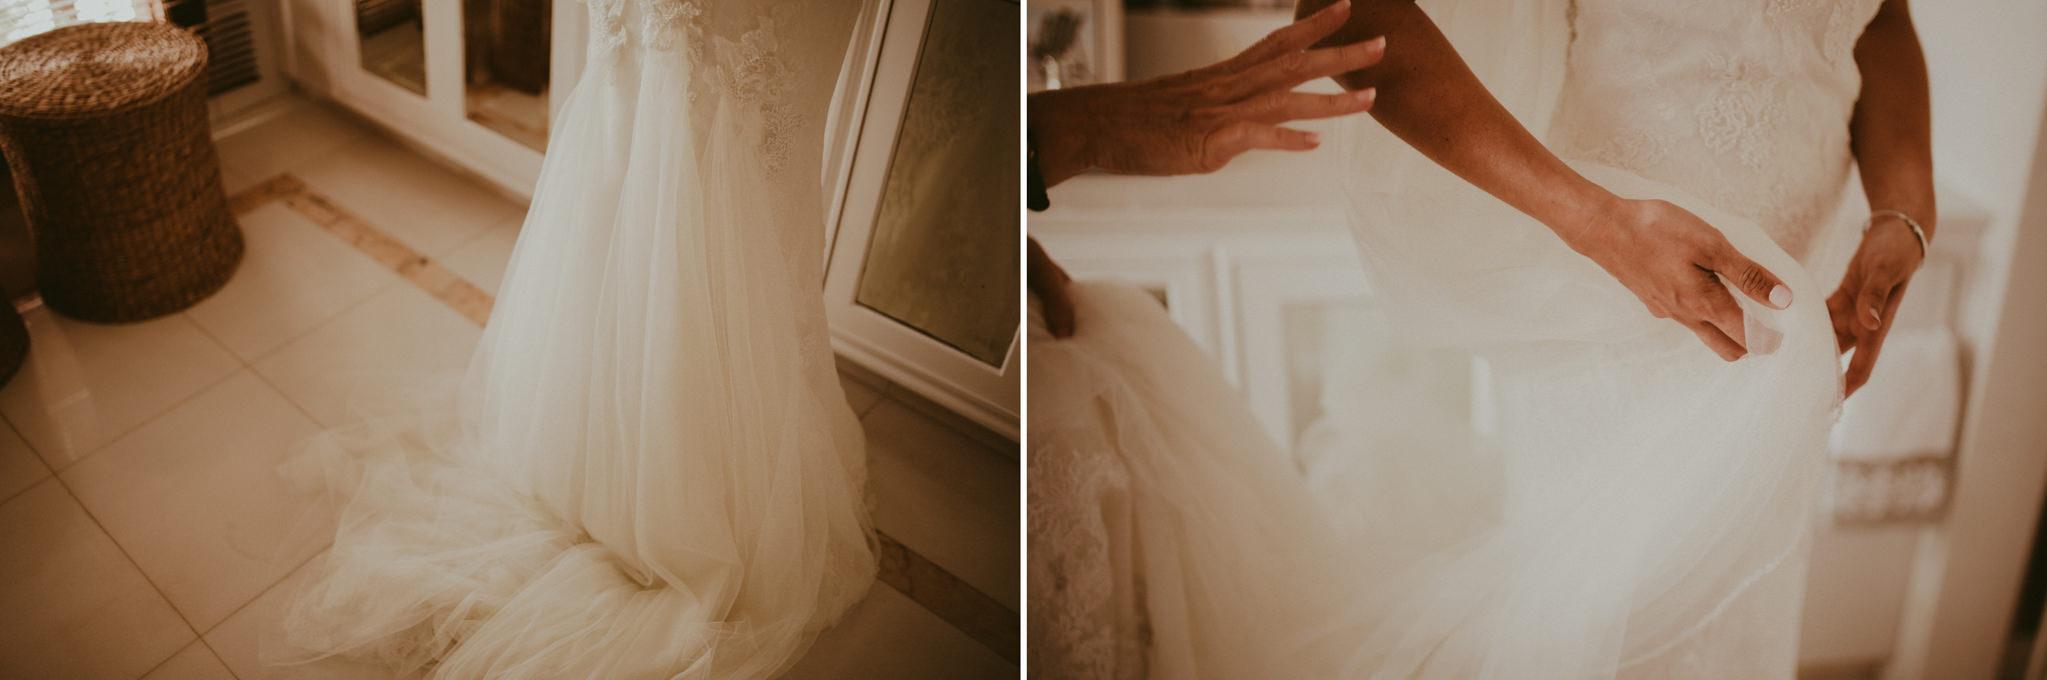 boda-diferente-fotografo-boda-laspalmas-grancanaria-109